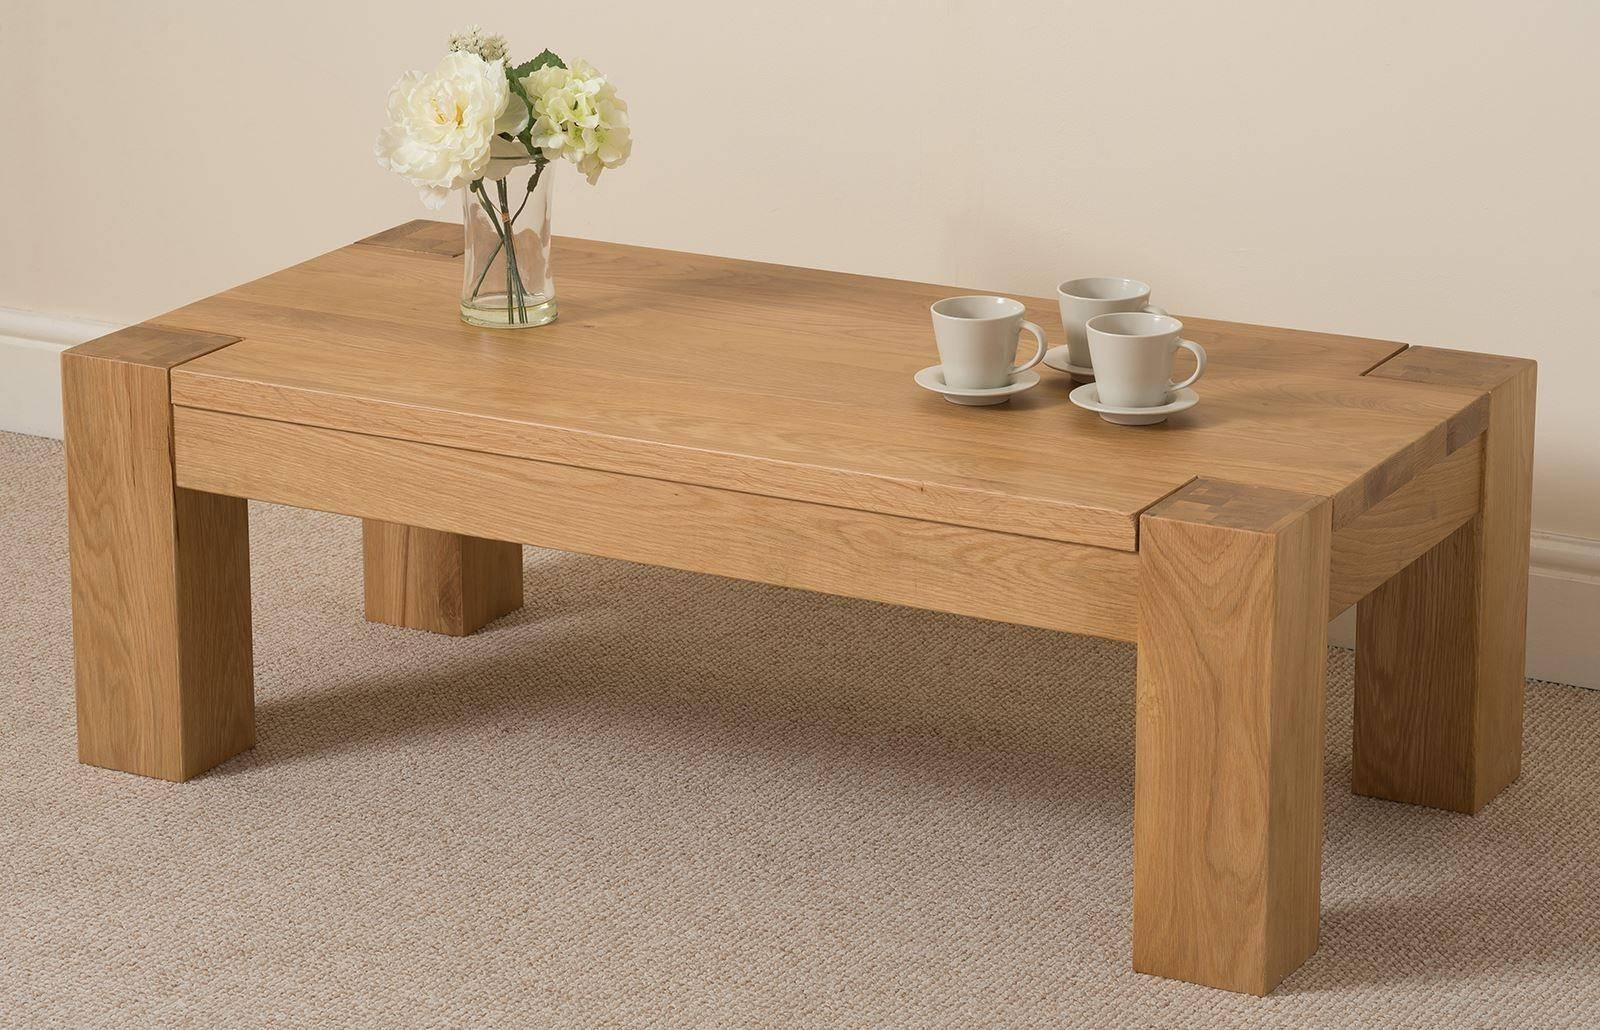 Kuba Solid Oak Large Coffee Table | Oak Furniture King throughout Solid Oak Coffee Tables (Image 12 of 15)